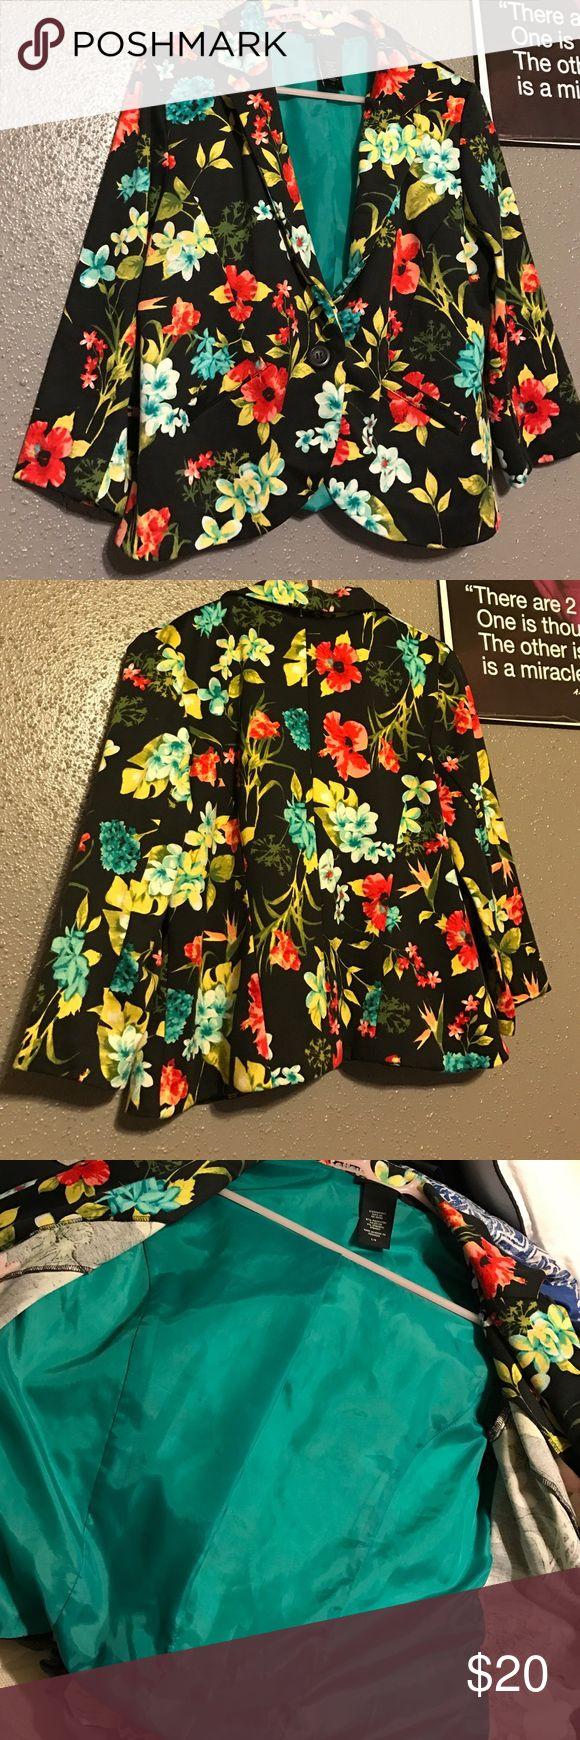 Crib thanksgiving sale - Thanksgiving Sale Firm Price Euc Metaphor Jackets Coats Blazers